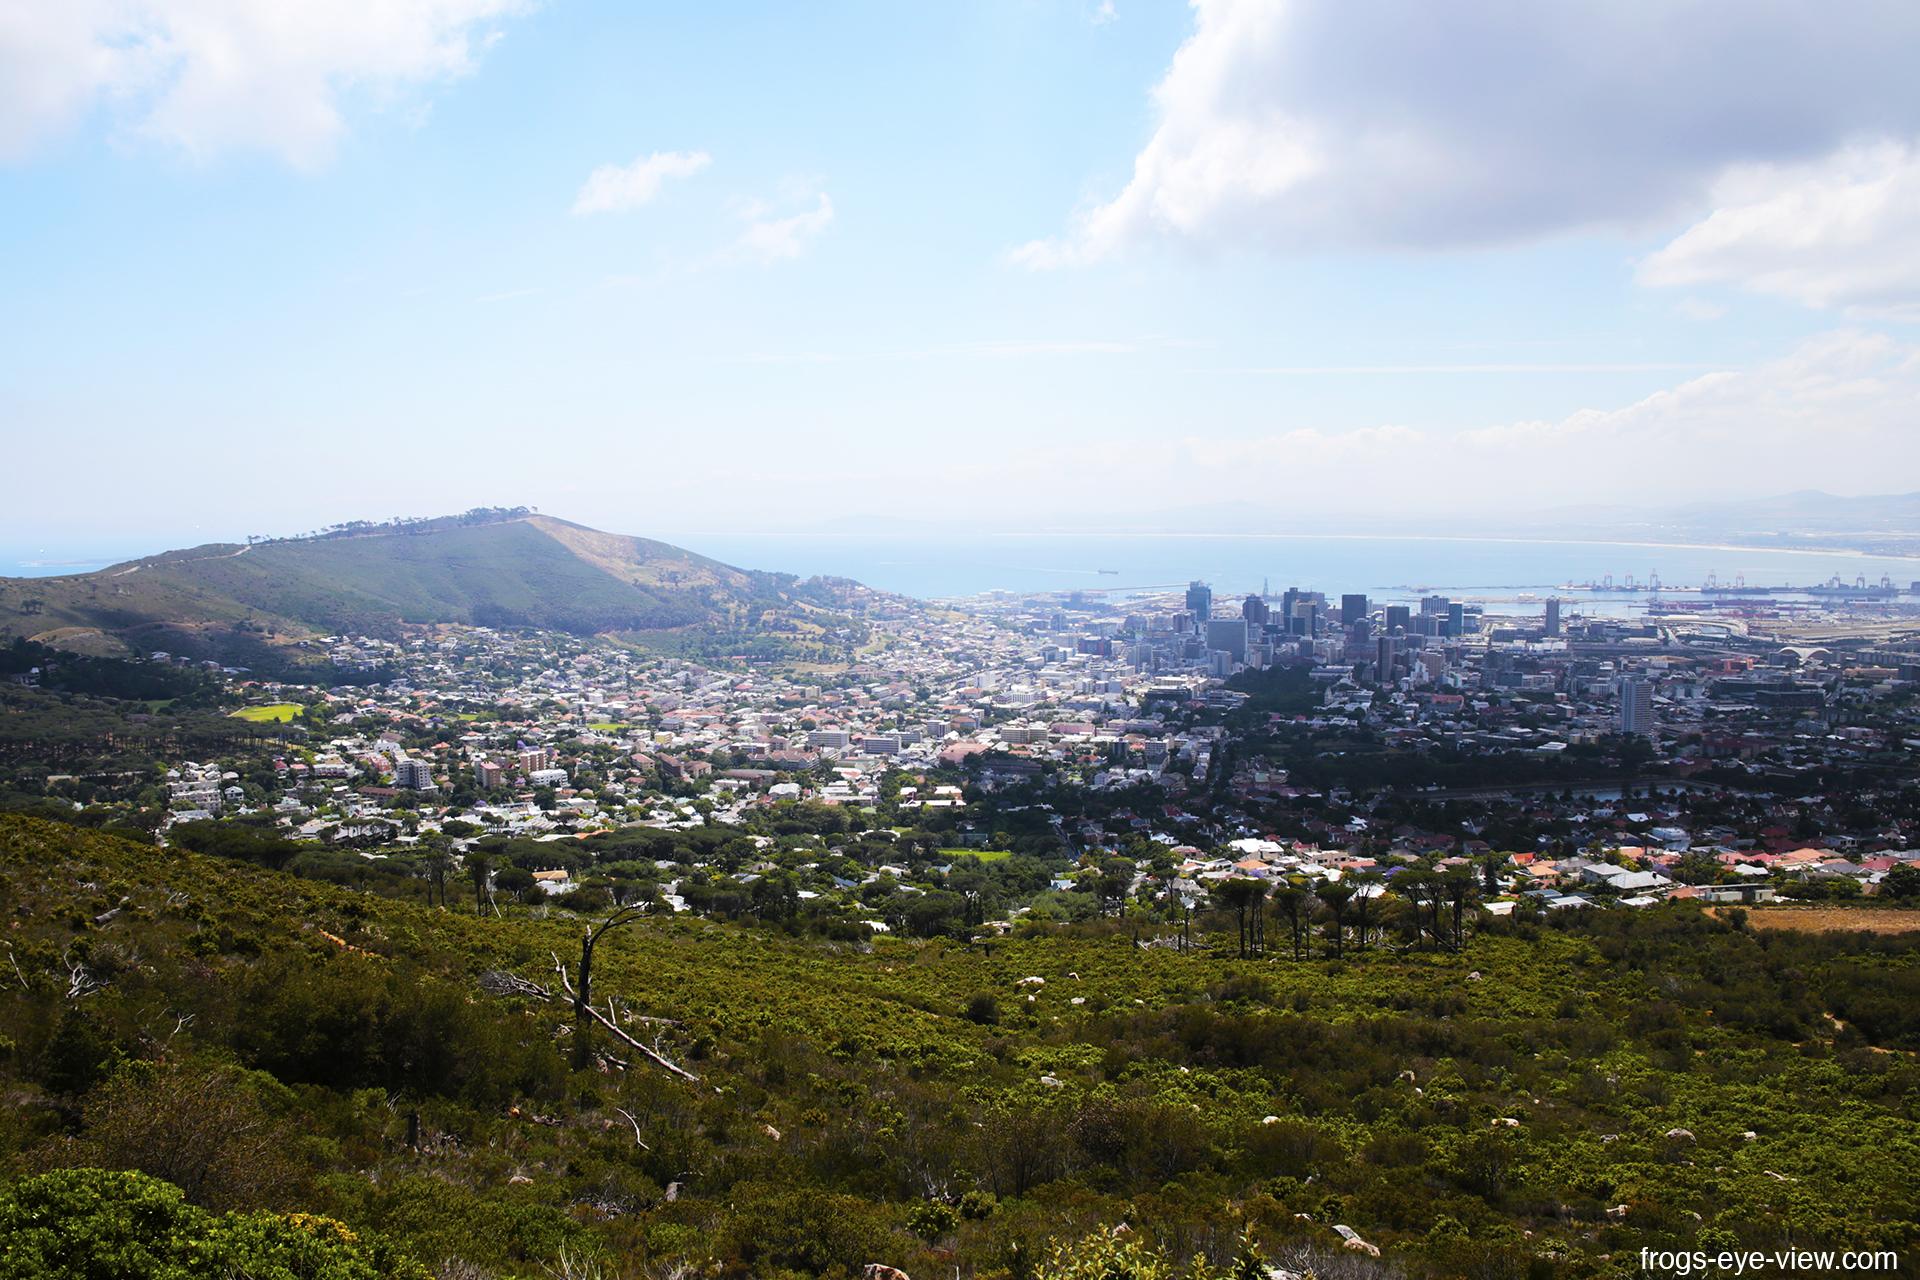 20160115_Afrika_151109-02_Capetown_MG_8237 Kopie